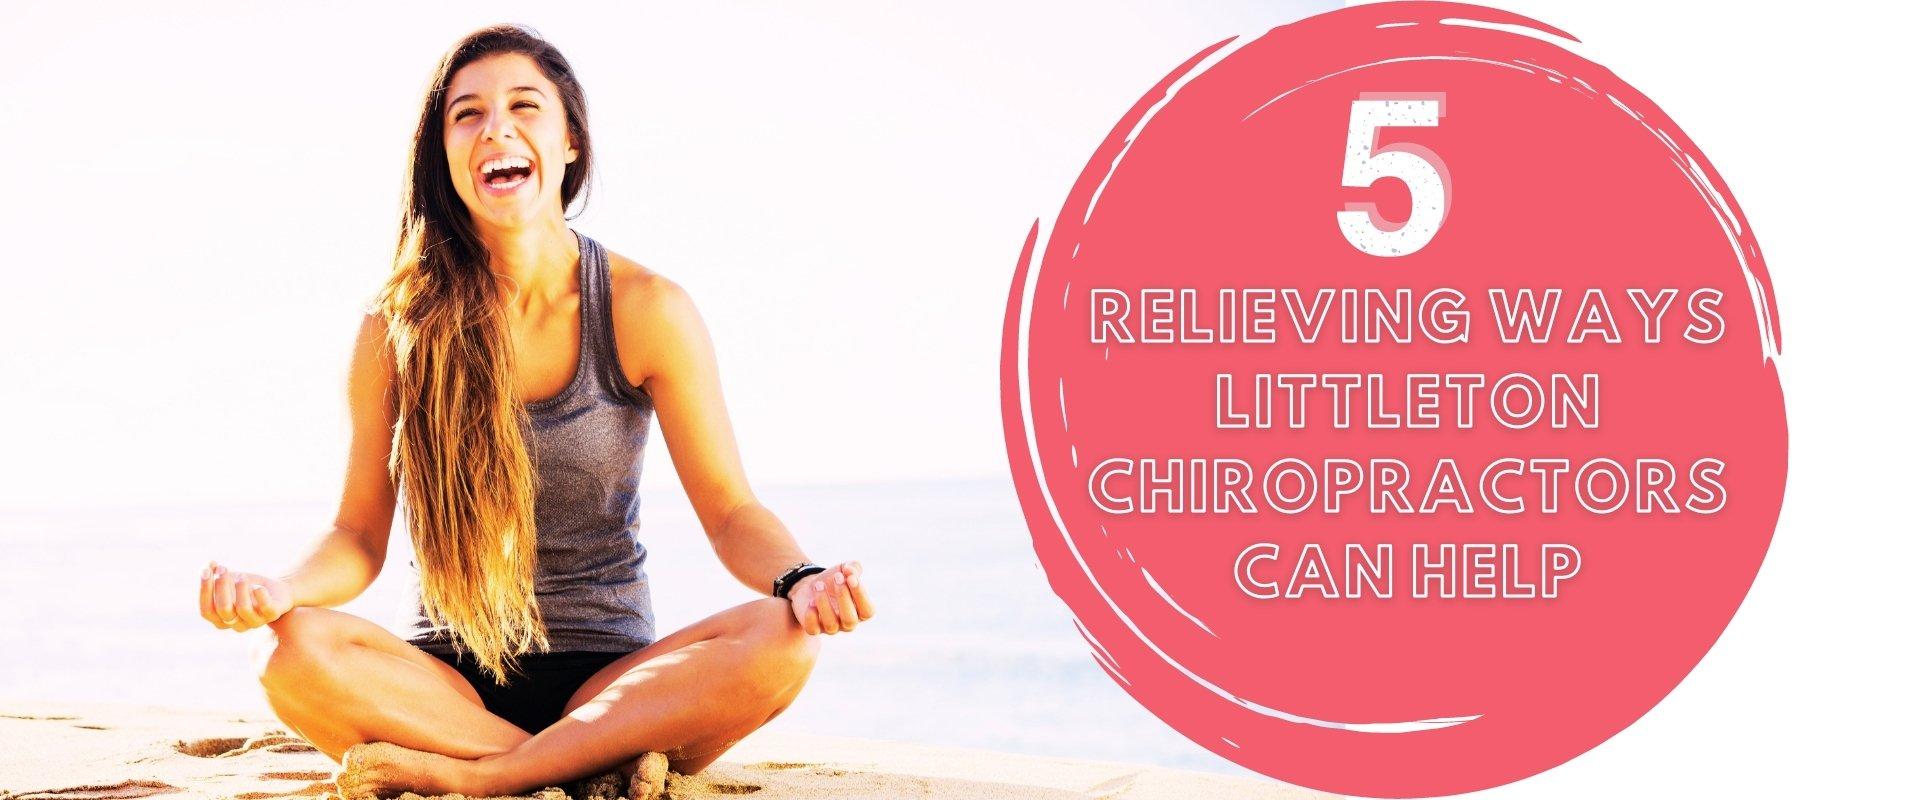 Relieving Ways Littleton Chiropractors Can Help